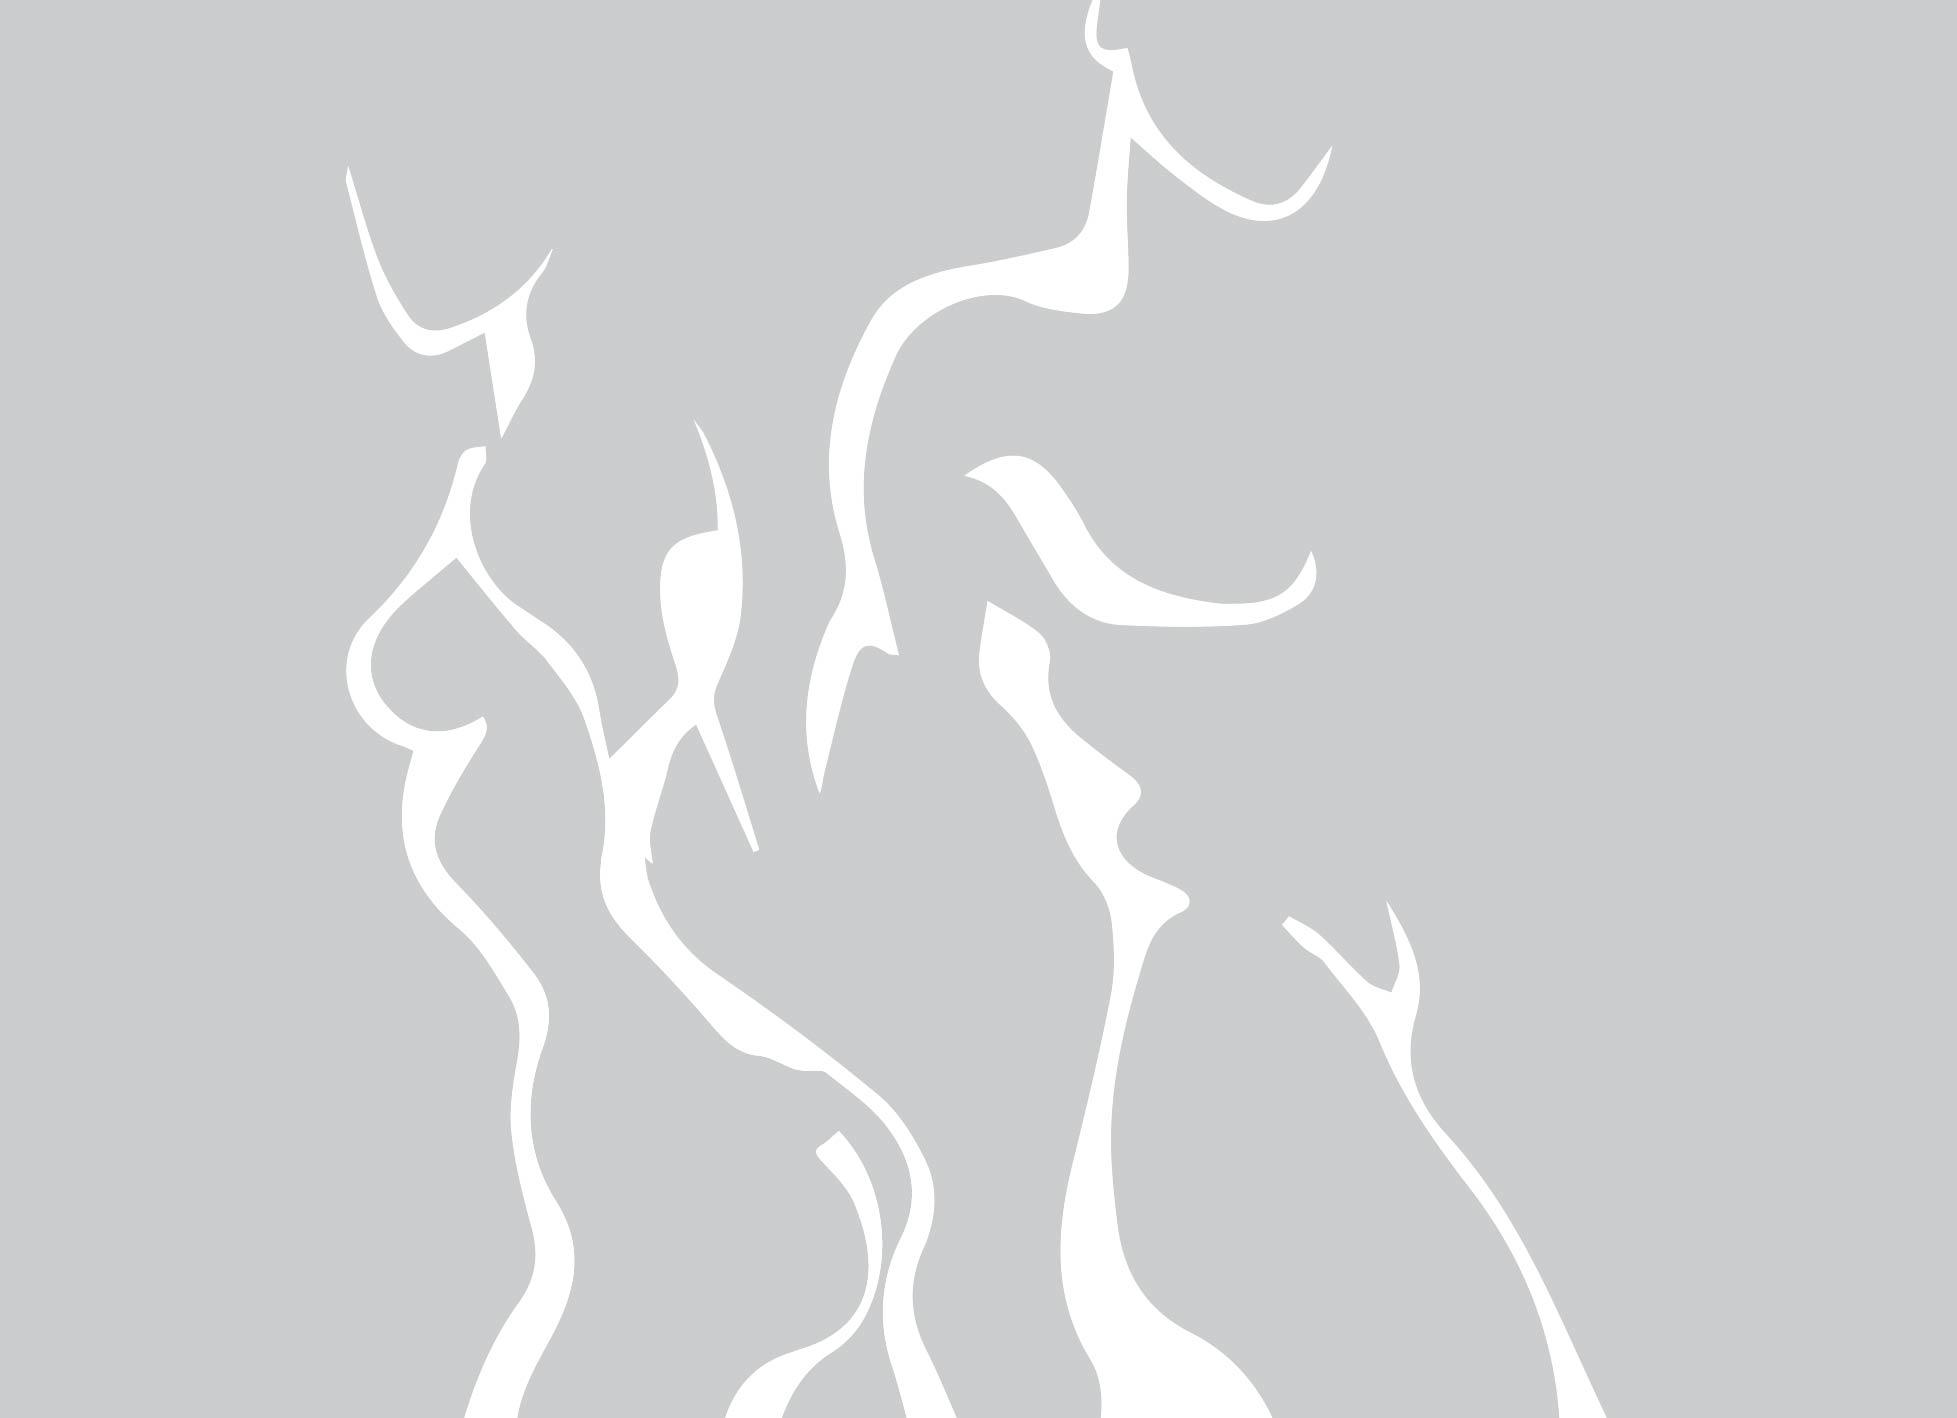 Badkamer en douche: Raamfolie douche - man/vrouw silhouette